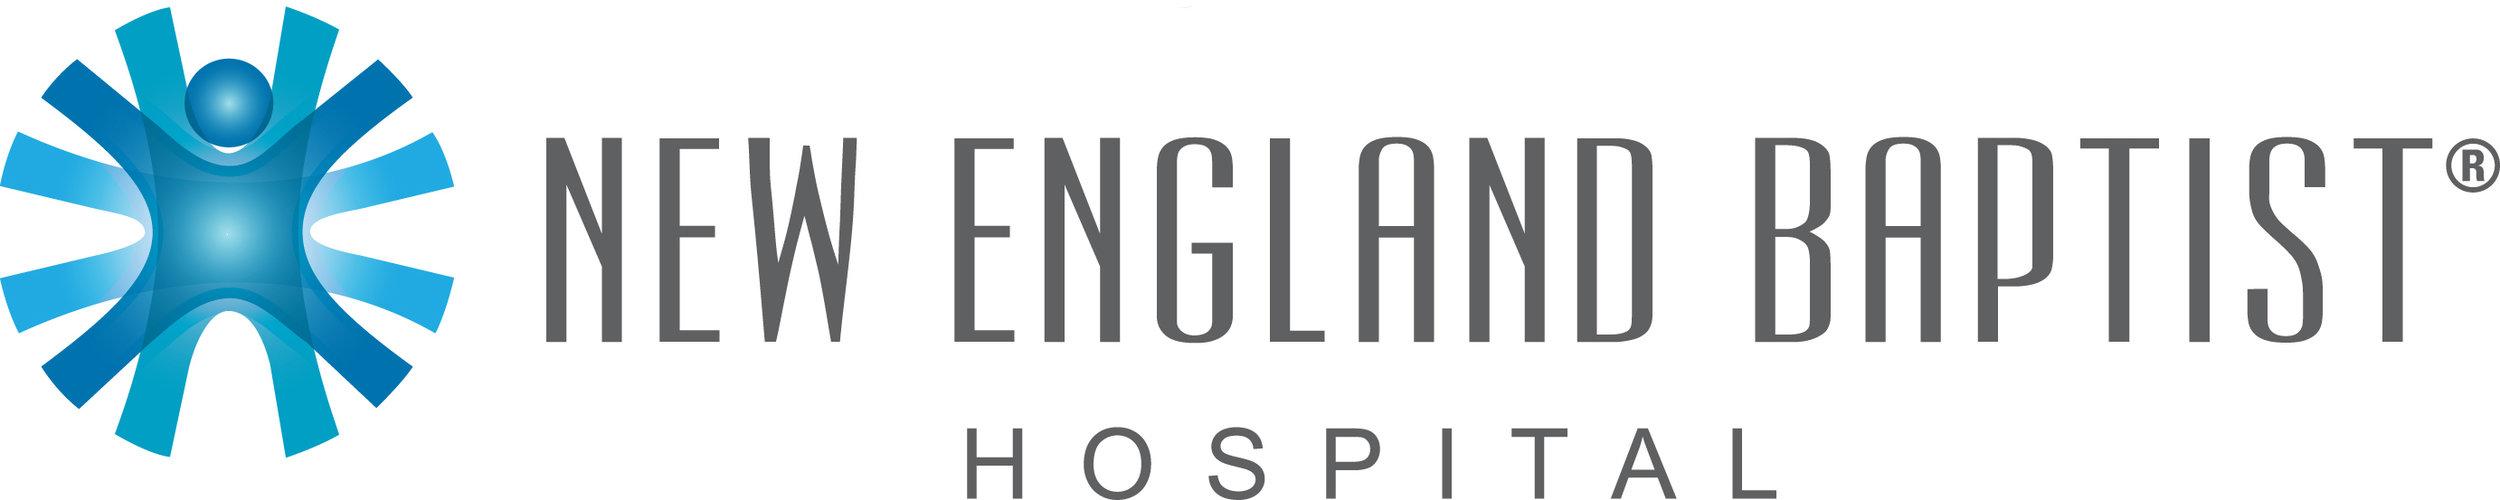 New England Baptist Hospital.jpg